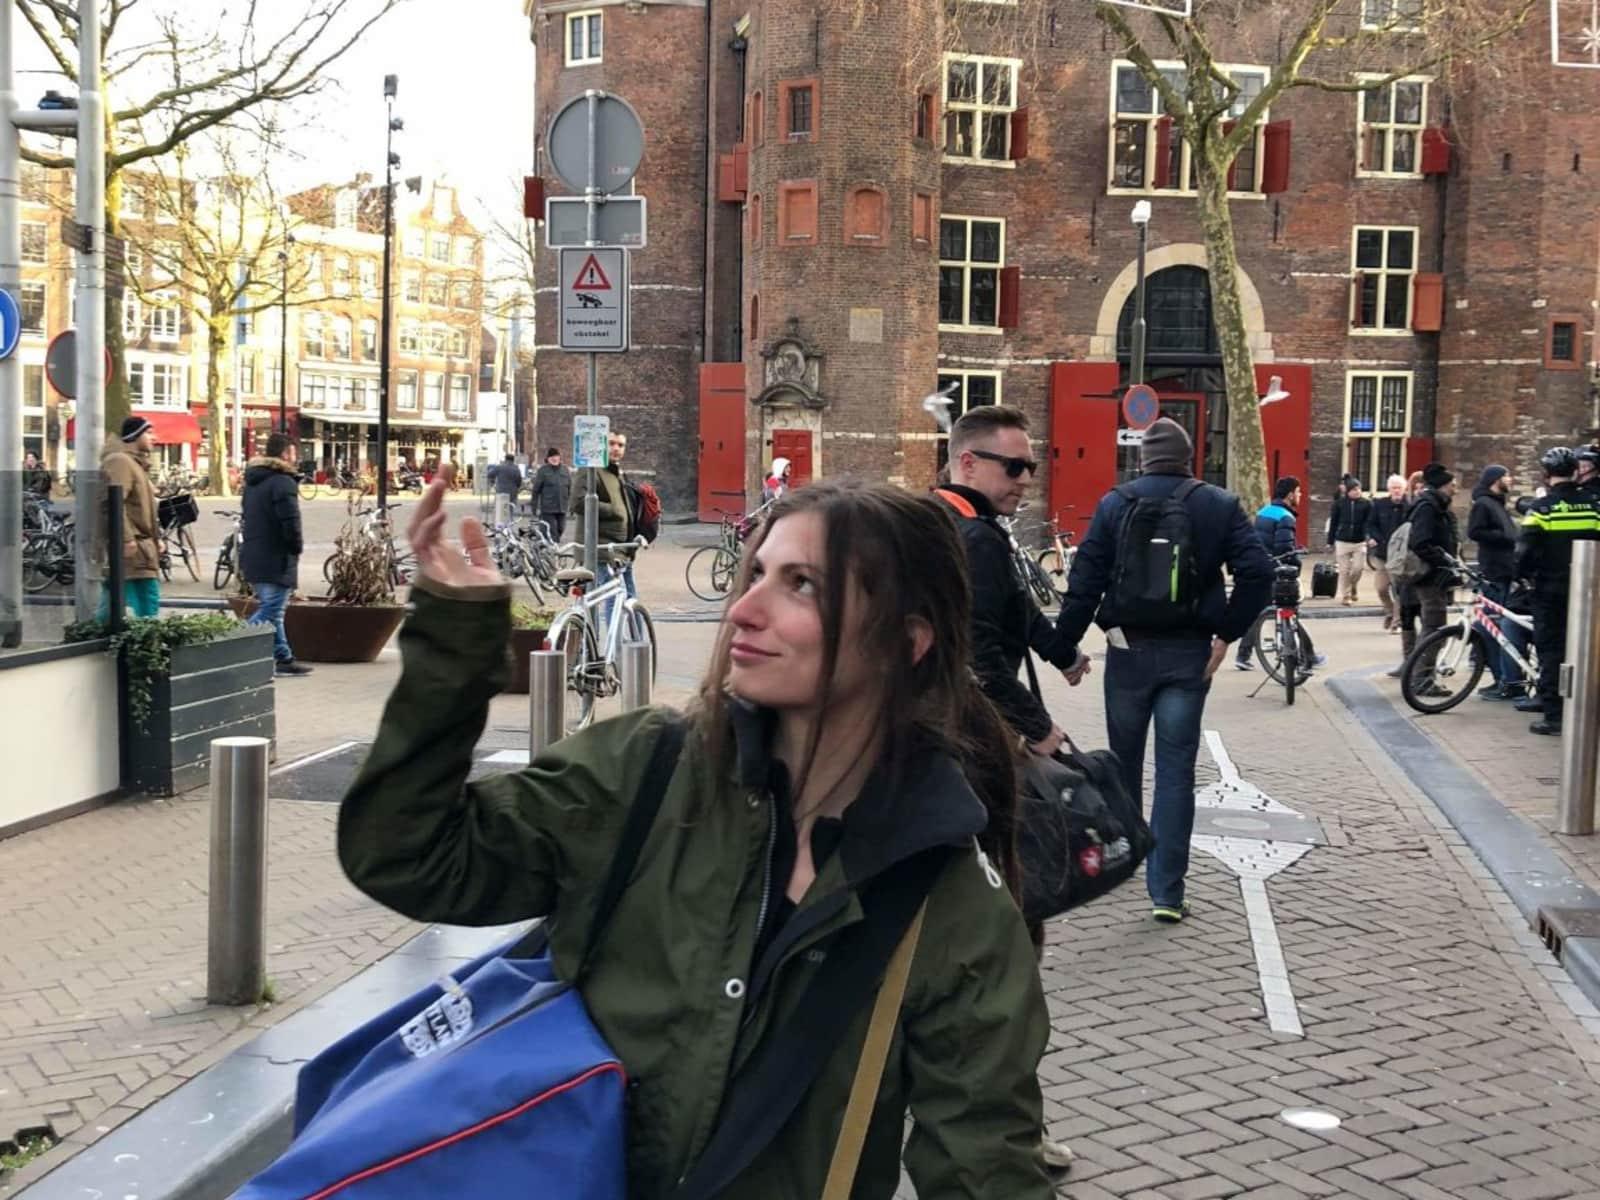 Christelle from Royal Leamington Spa, United Kingdom